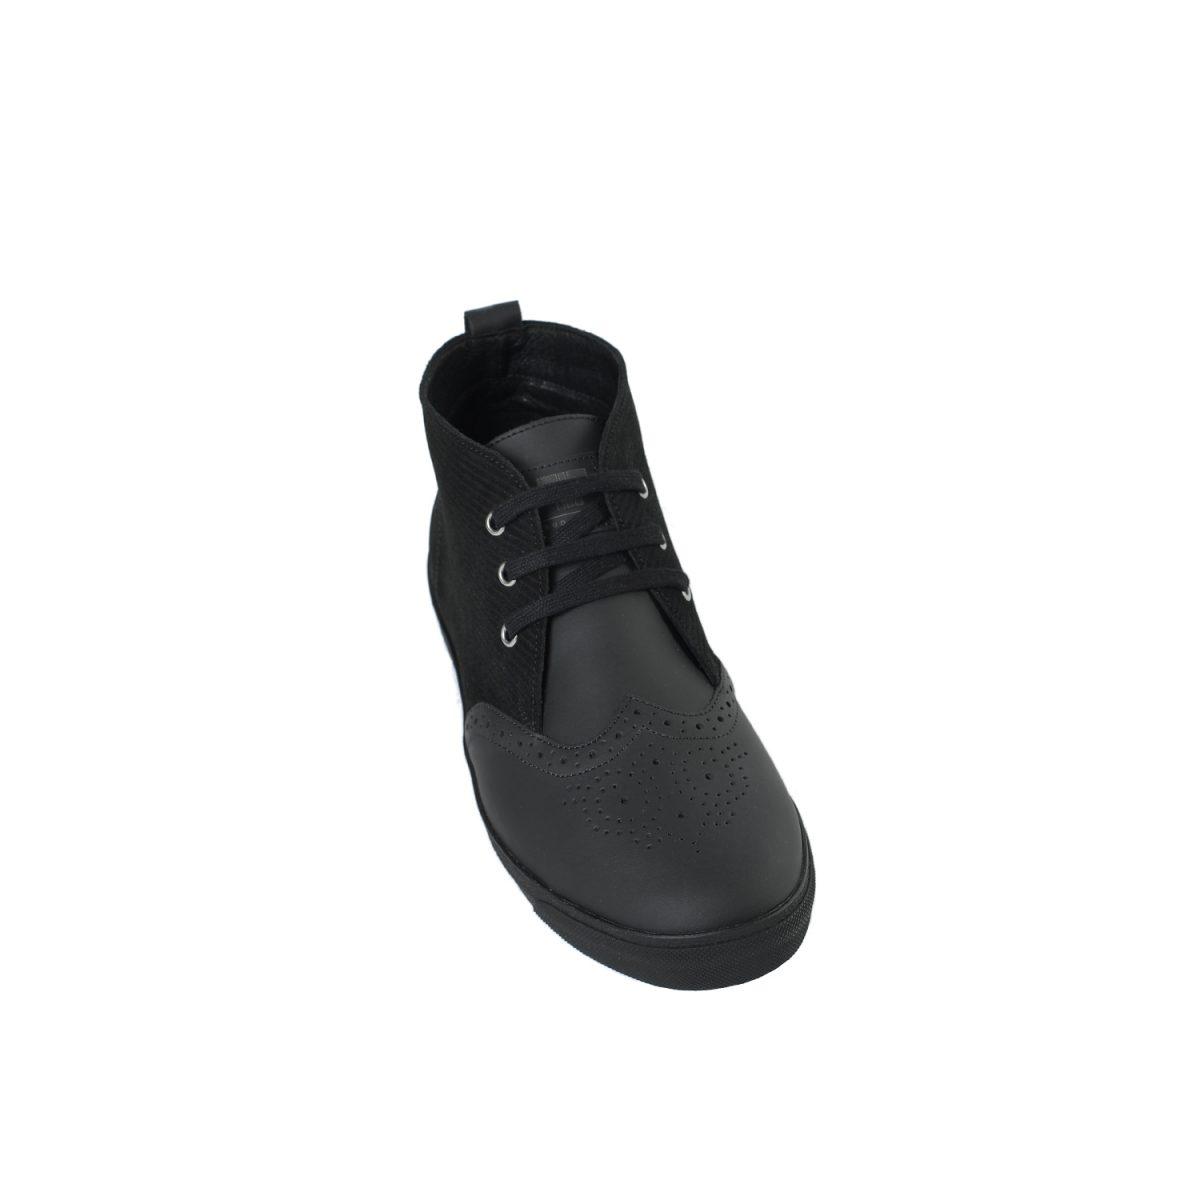 Tisza cipő - Alfa - Fekete-klasszik